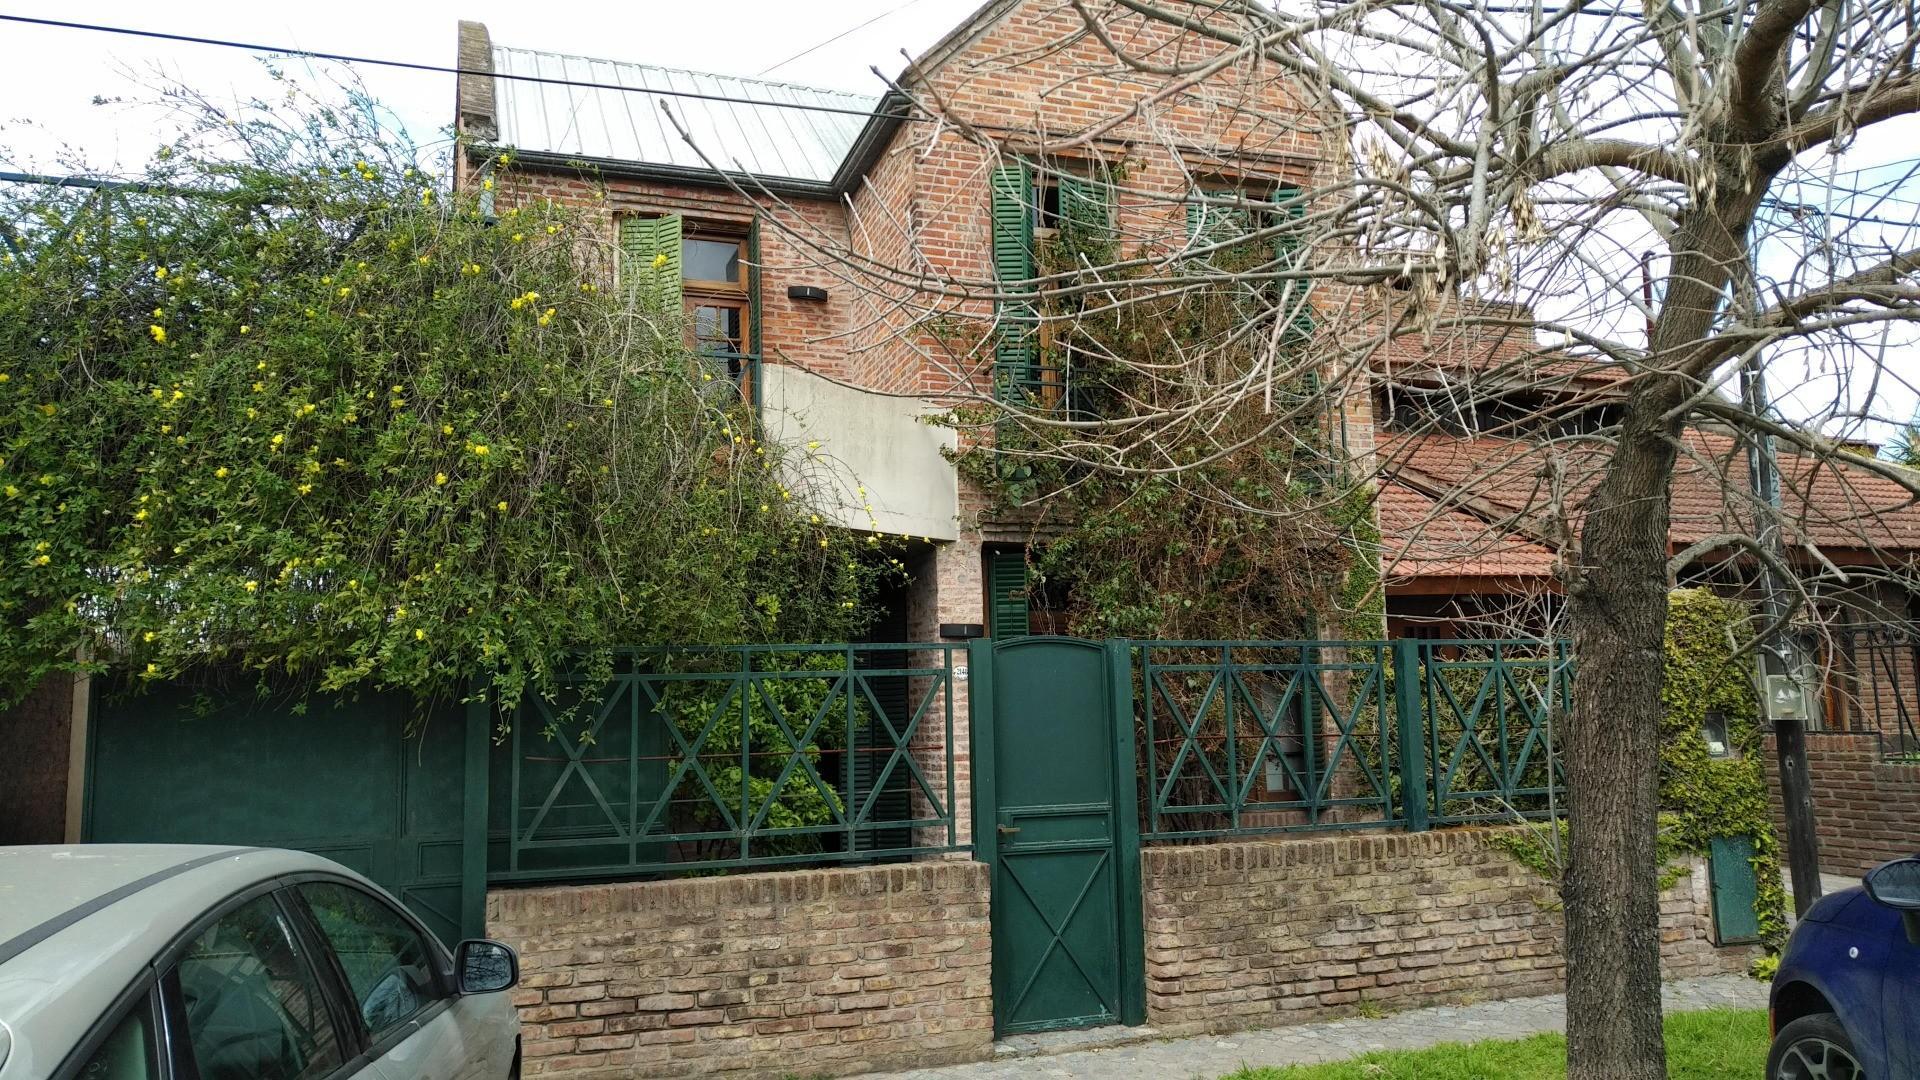 Casa en Venta en Manuel B Gonnet - 7 ambientes